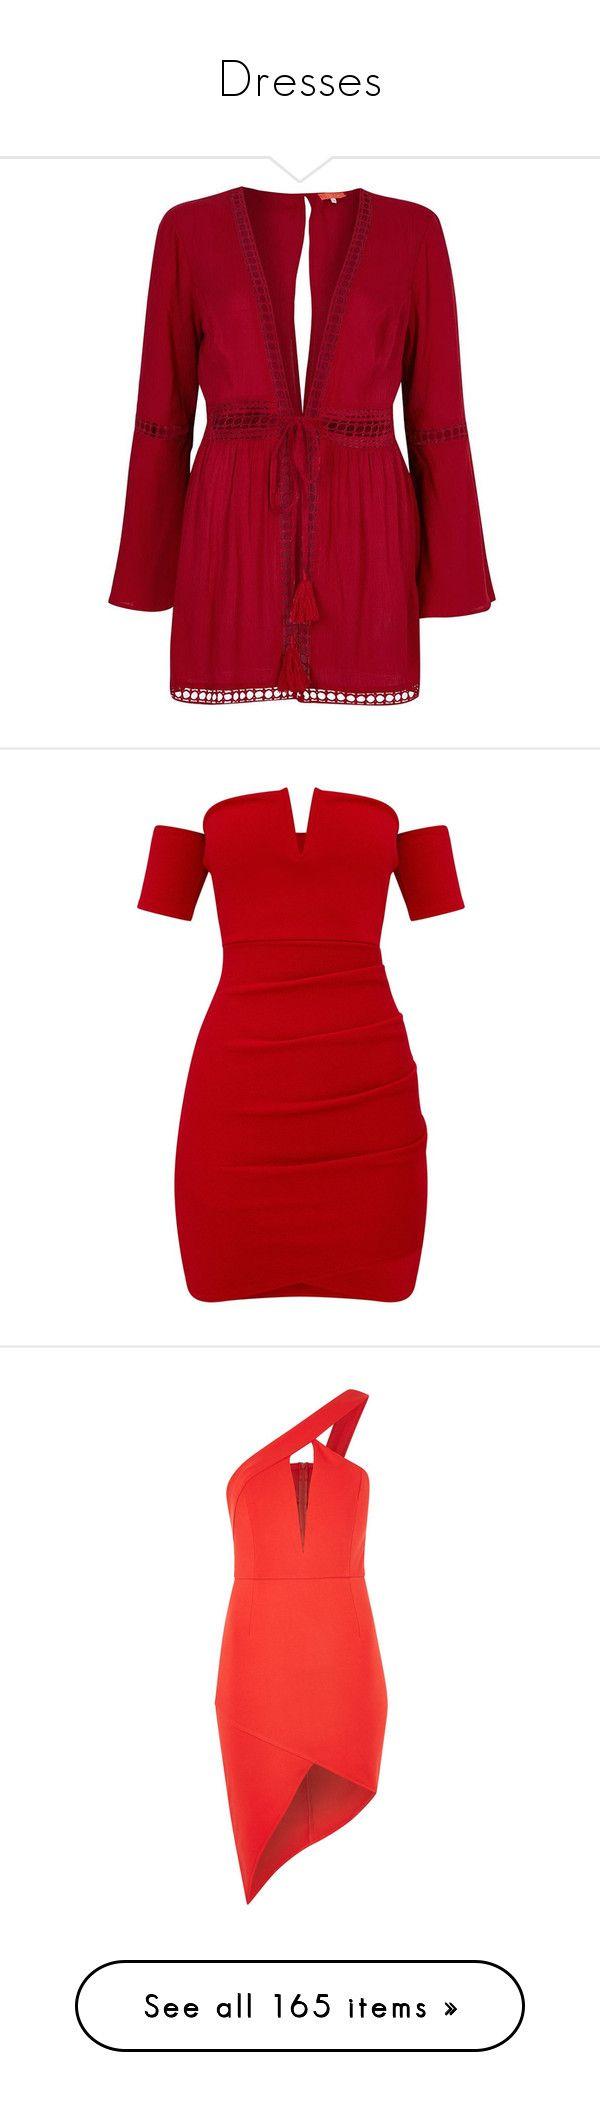 """Dresses"" by mollystedman30 ❤ liked on Polyvore featuring dresses, red, tops, sale, swimwear & beachwear, women, river island, long caftan, beach caftan and long beach kaftan"